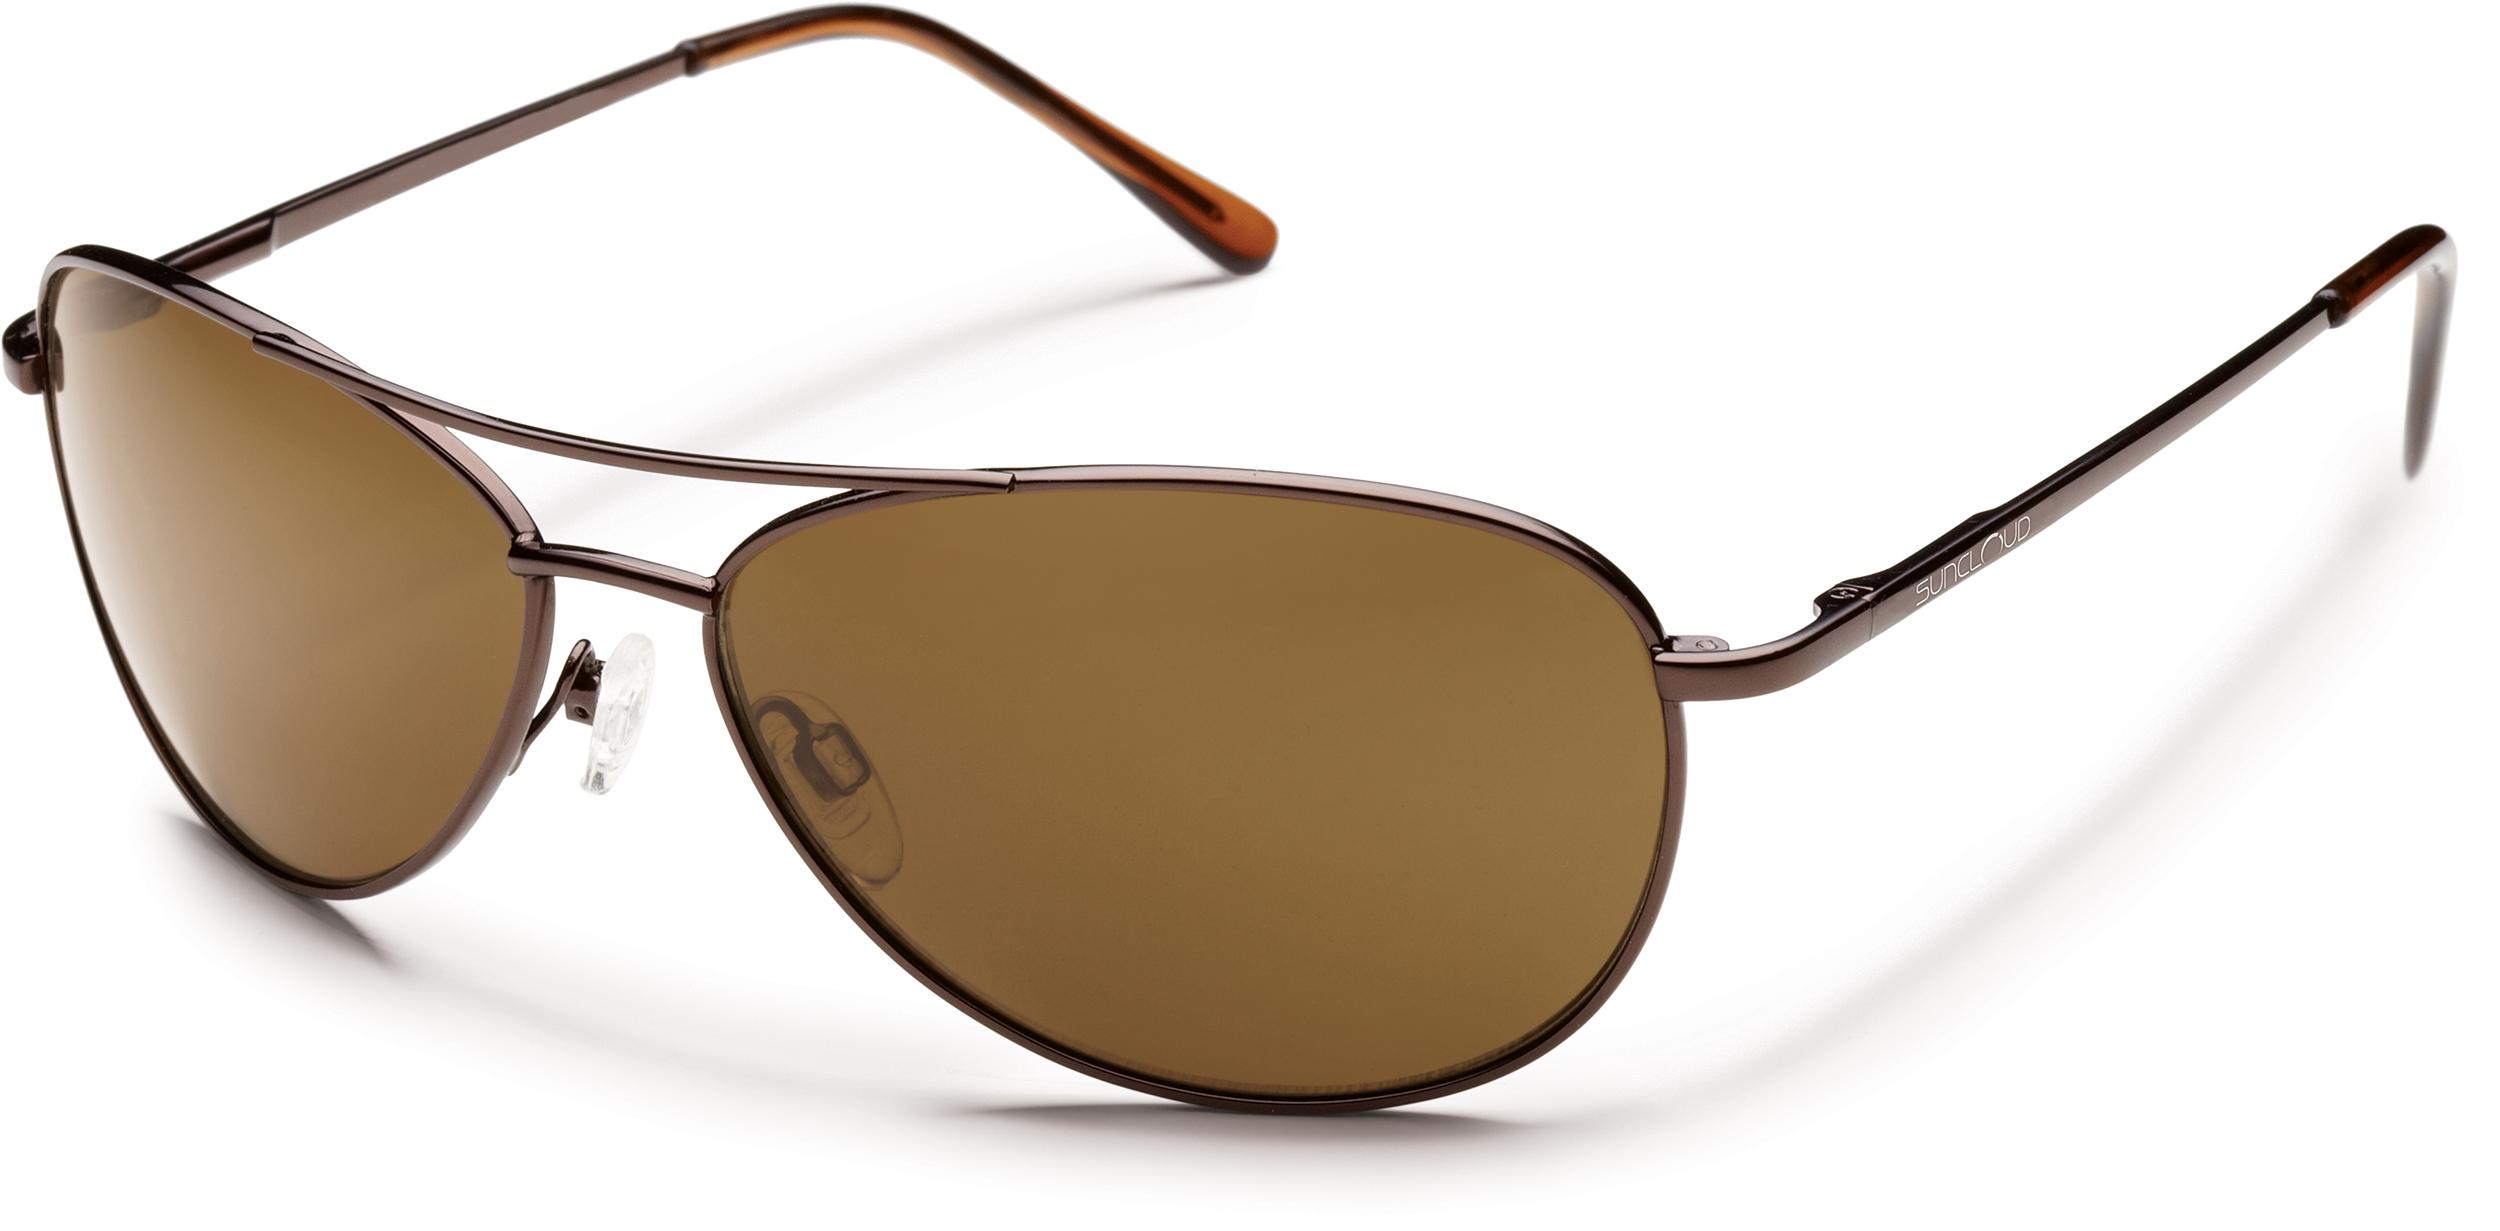 c326542688 Suncloud Patrol Polarized Sunglasses - Unisex